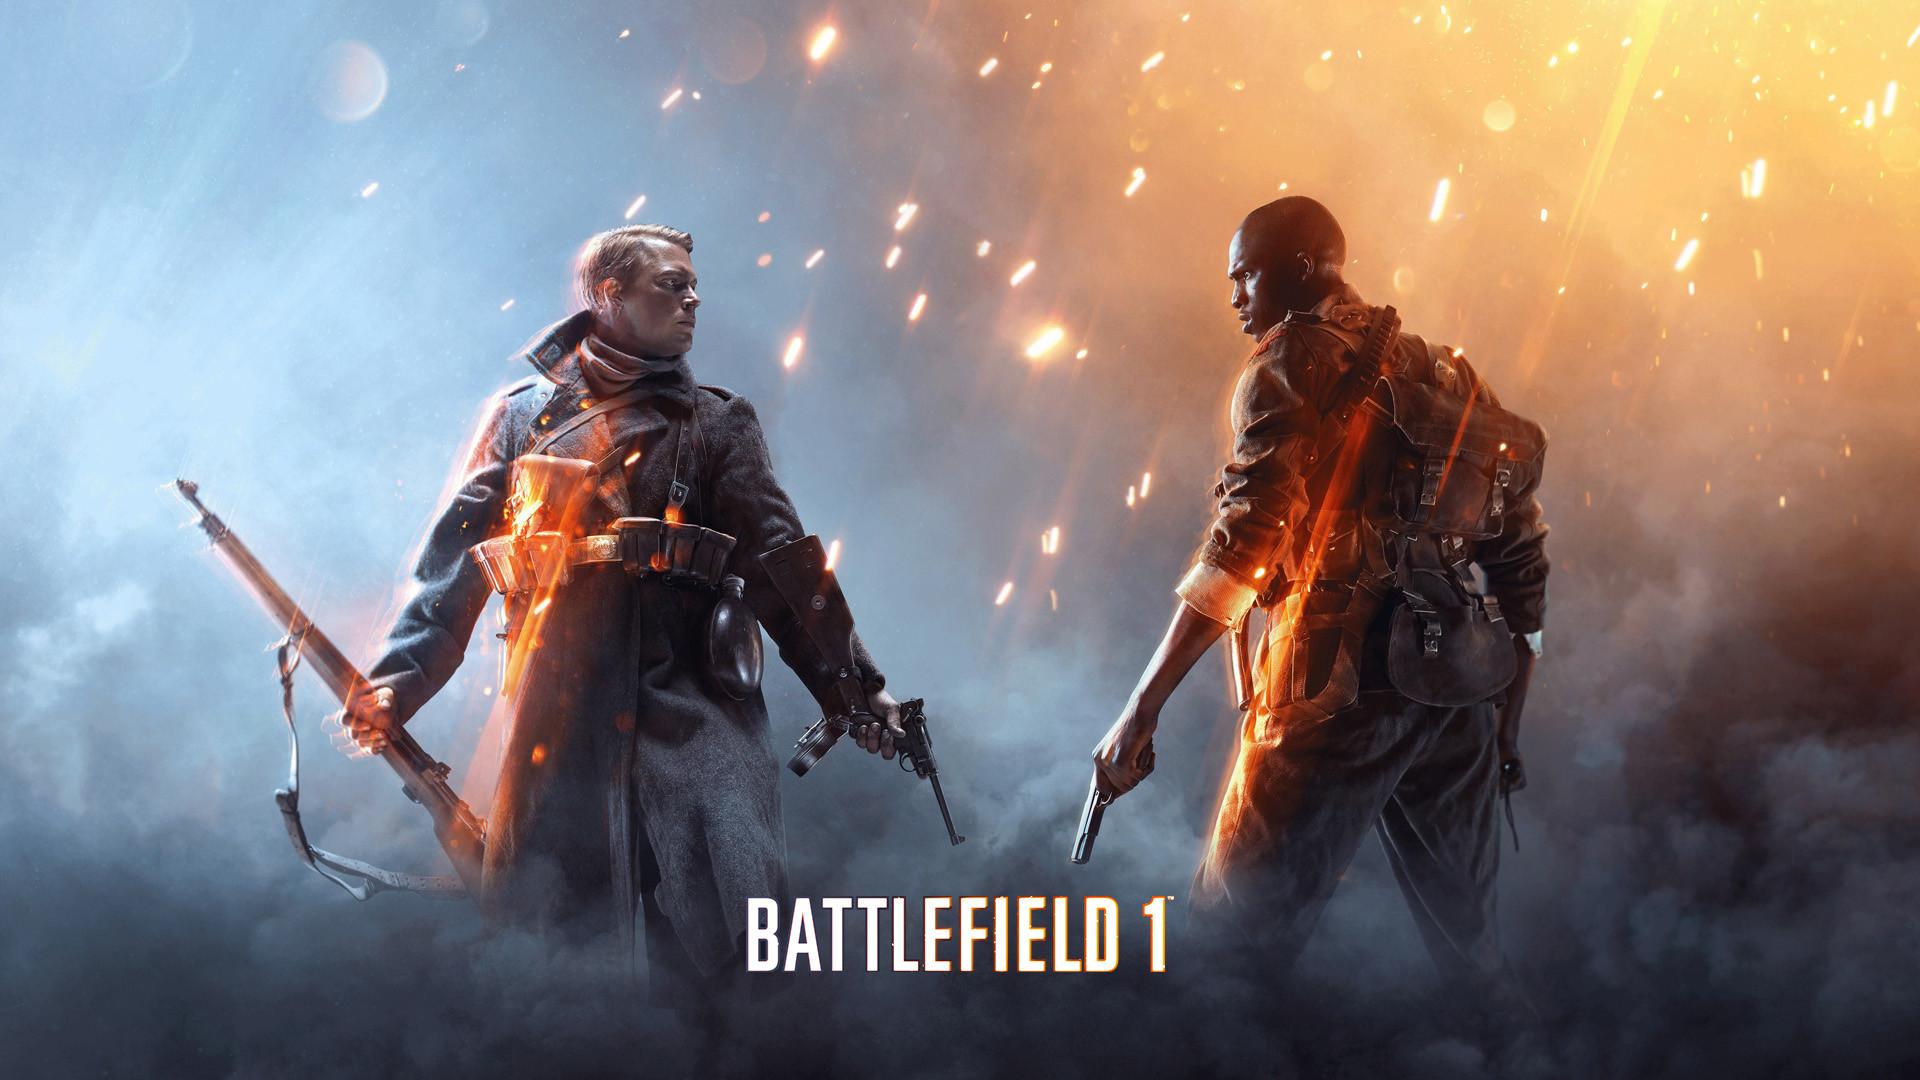 Préférence Battlefield 1 Wallpaper (72+ images) DK28